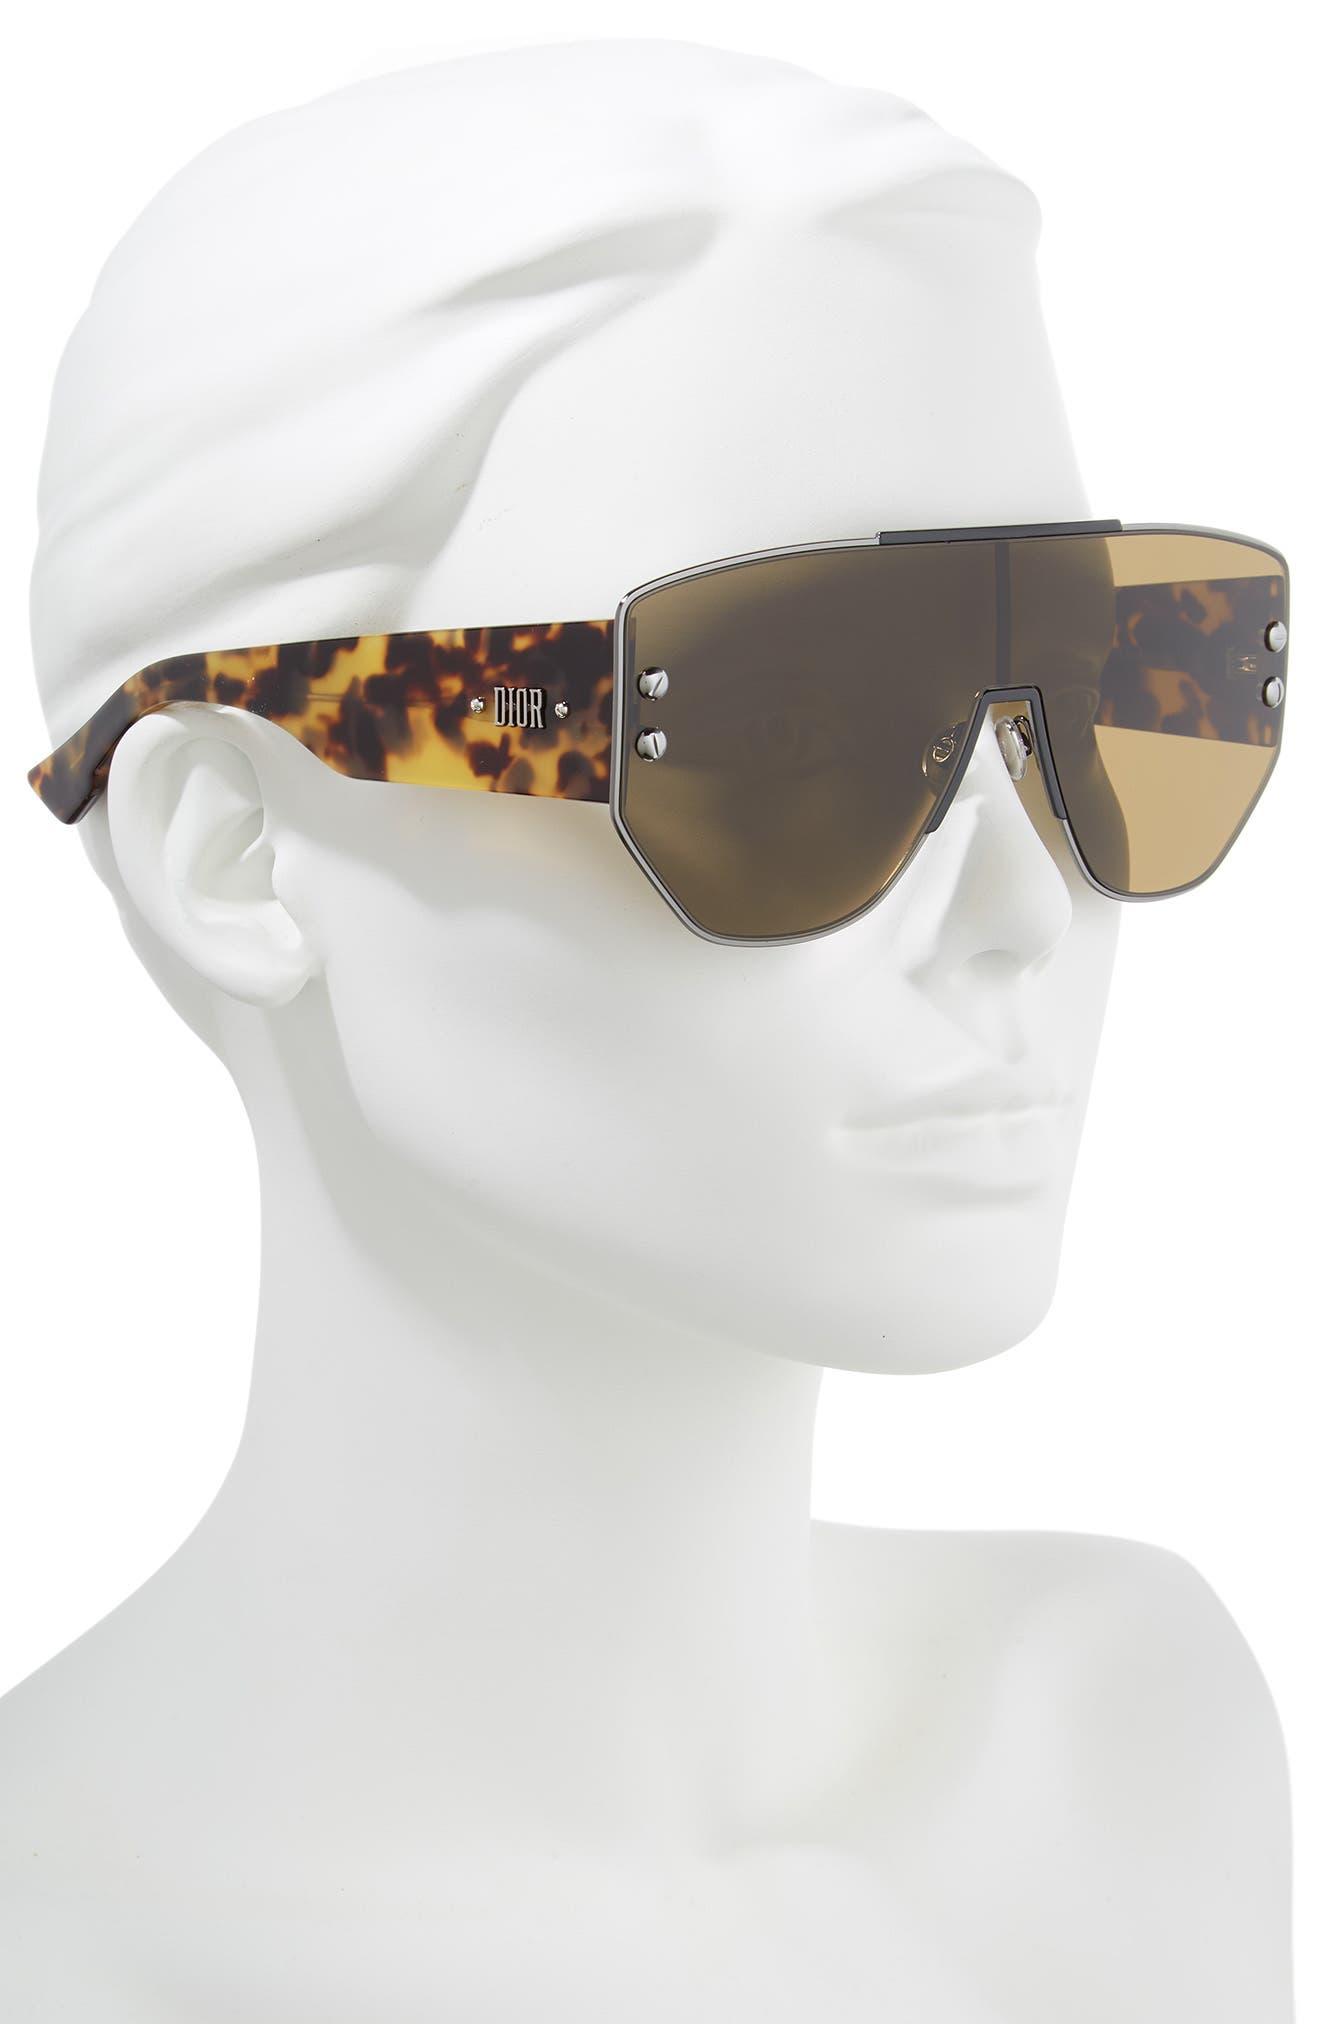 72mm Rimless Shield Sunglasses,                             Alternate thumbnail 2, color,                             DARK RUTHENIUM/ BLACK